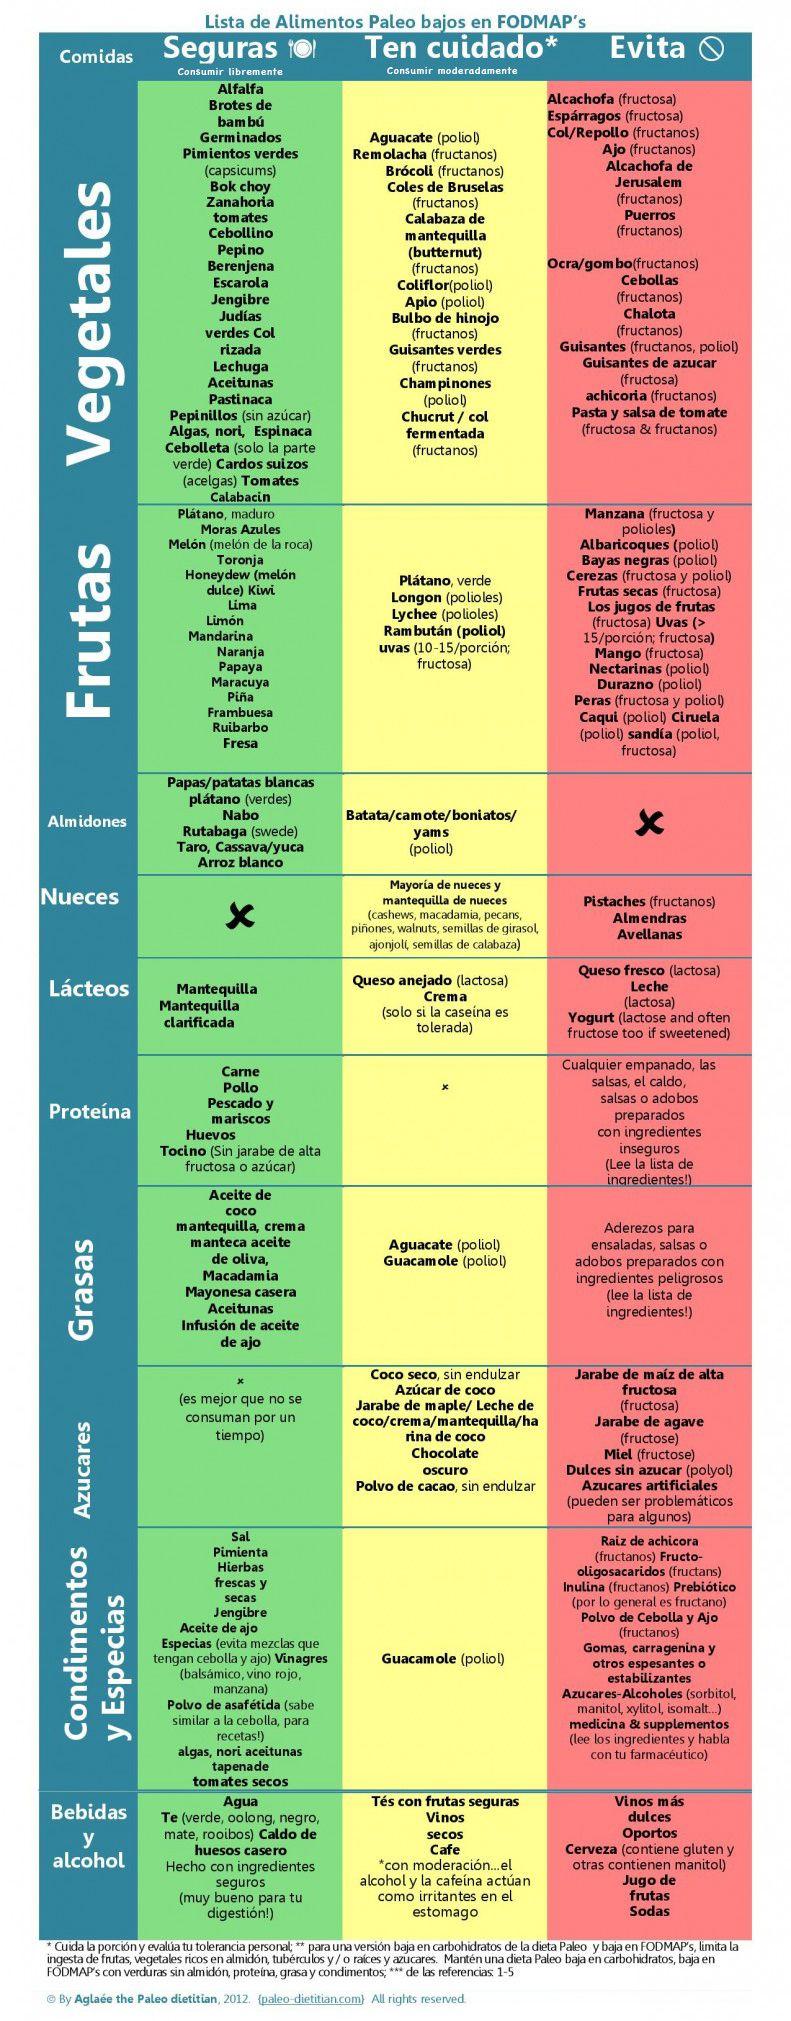 Colon irritable dieta paleo